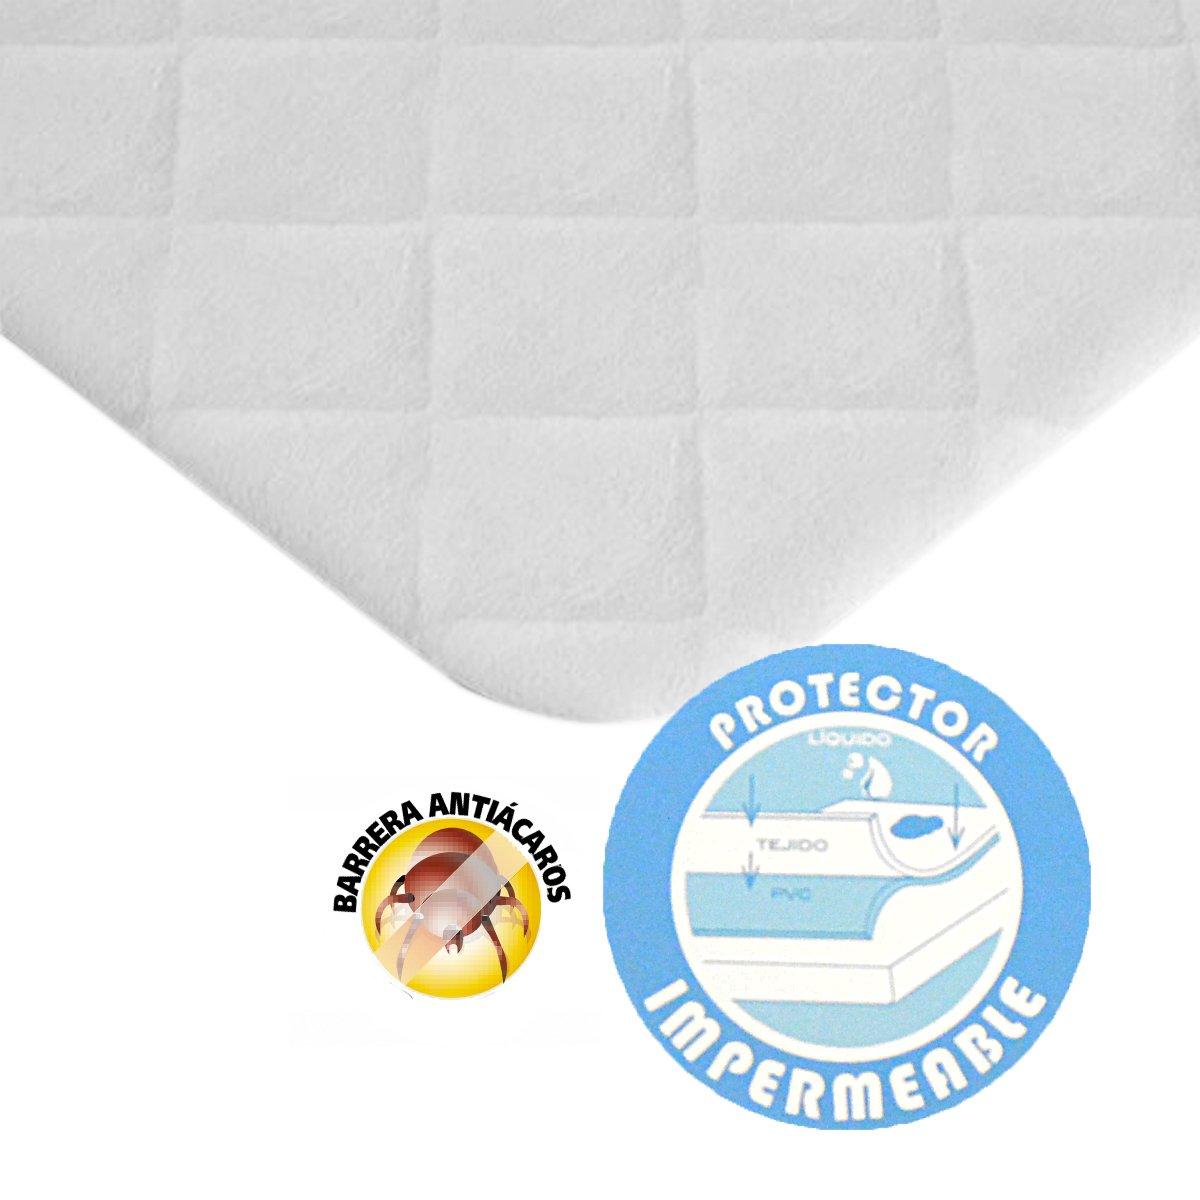 40 X 80 cm Pekitas Matratzen-Schutzbezug f/ür Kinderbett wasserdicht